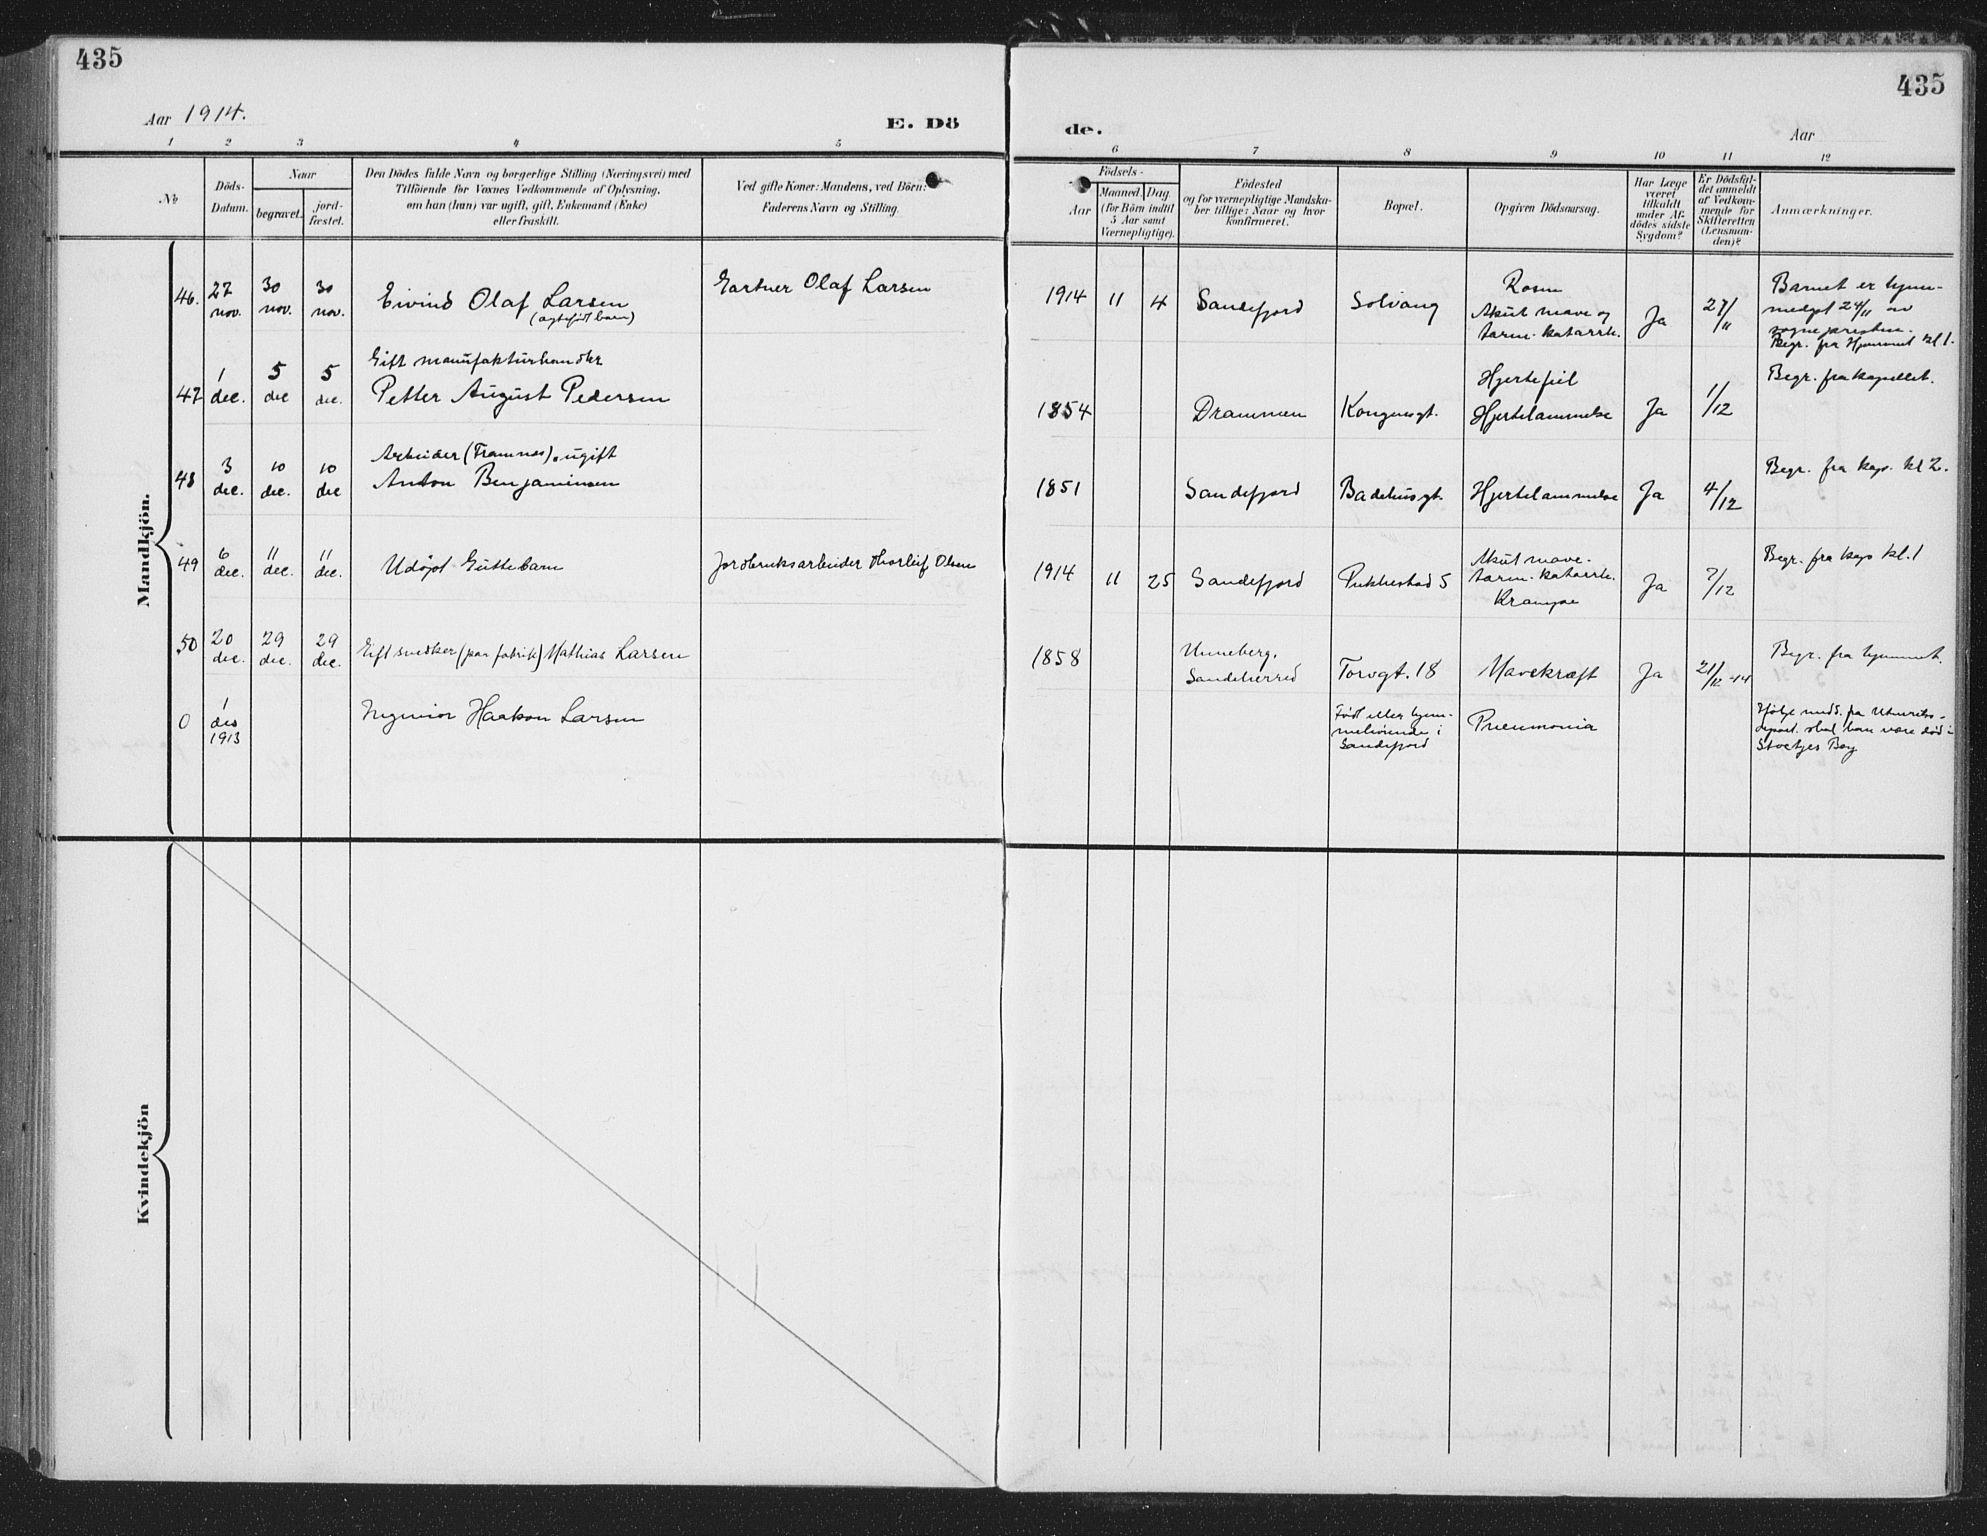 SAKO, Sandefjord kirkebøker, G/Ga/L0003: Klokkerbok nr. 3, 1903-1920, s. 435